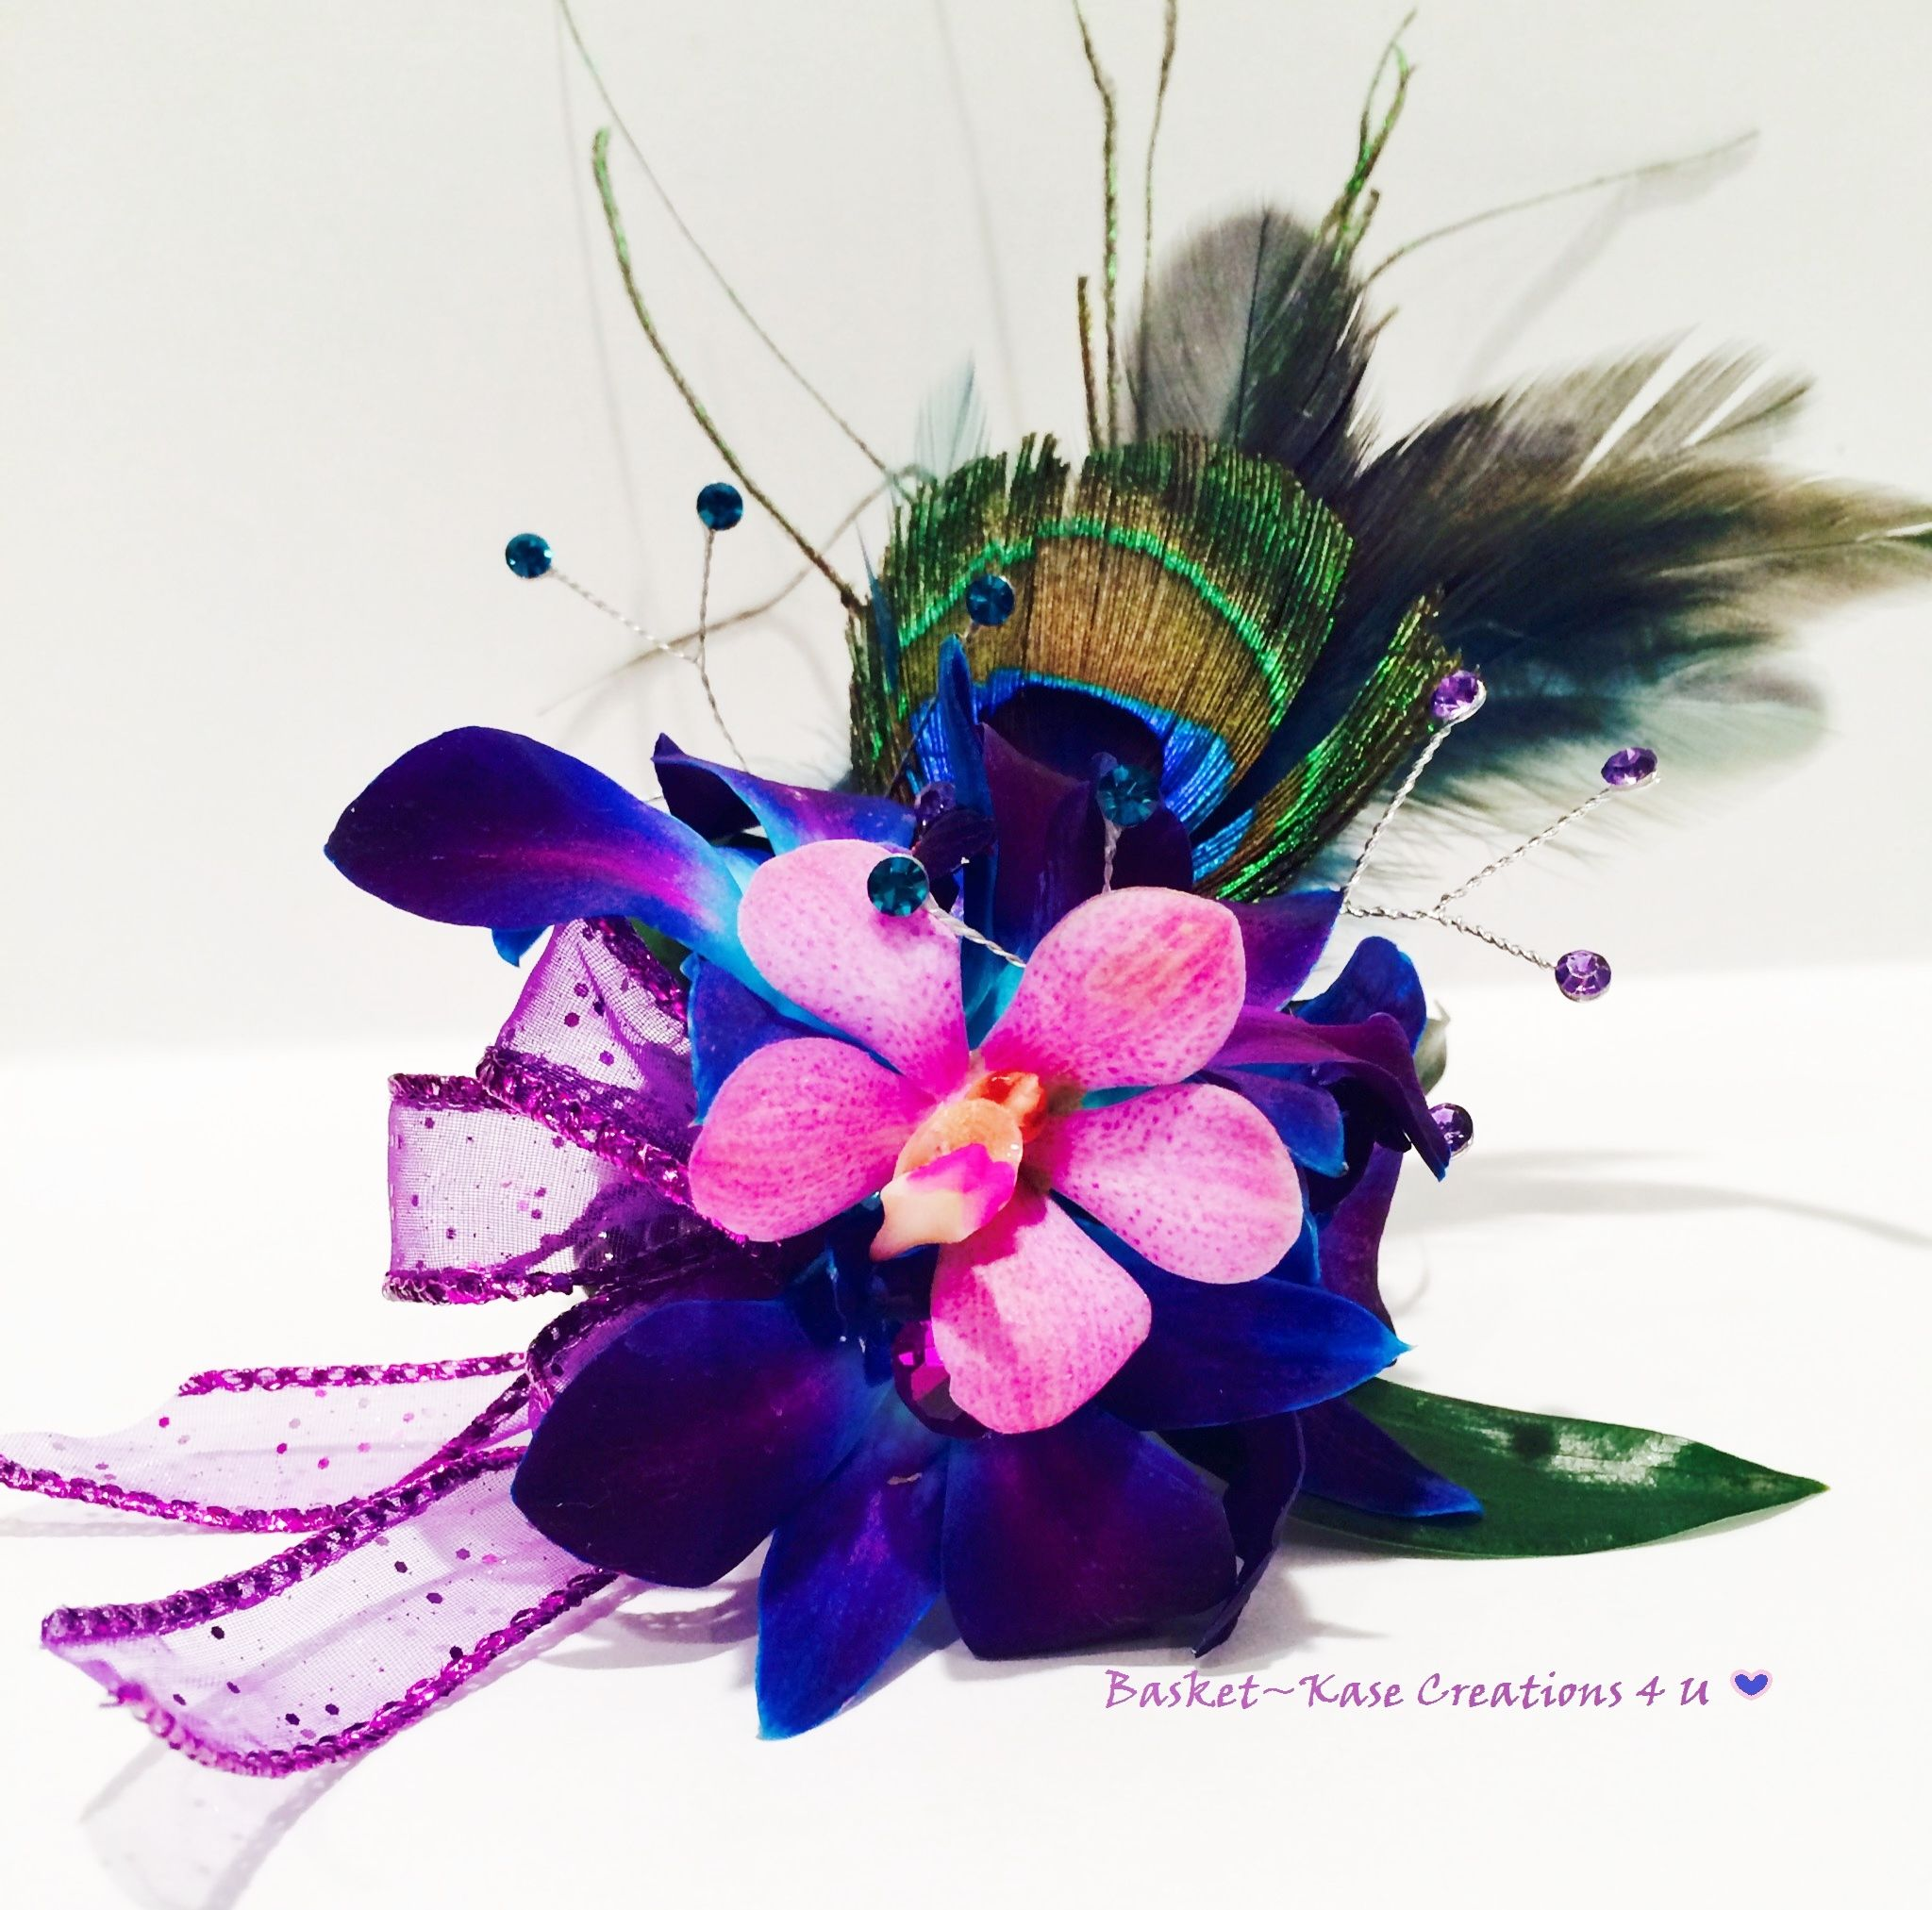 Basket kase creations u wrist corsage dendrobium u mokara orchid